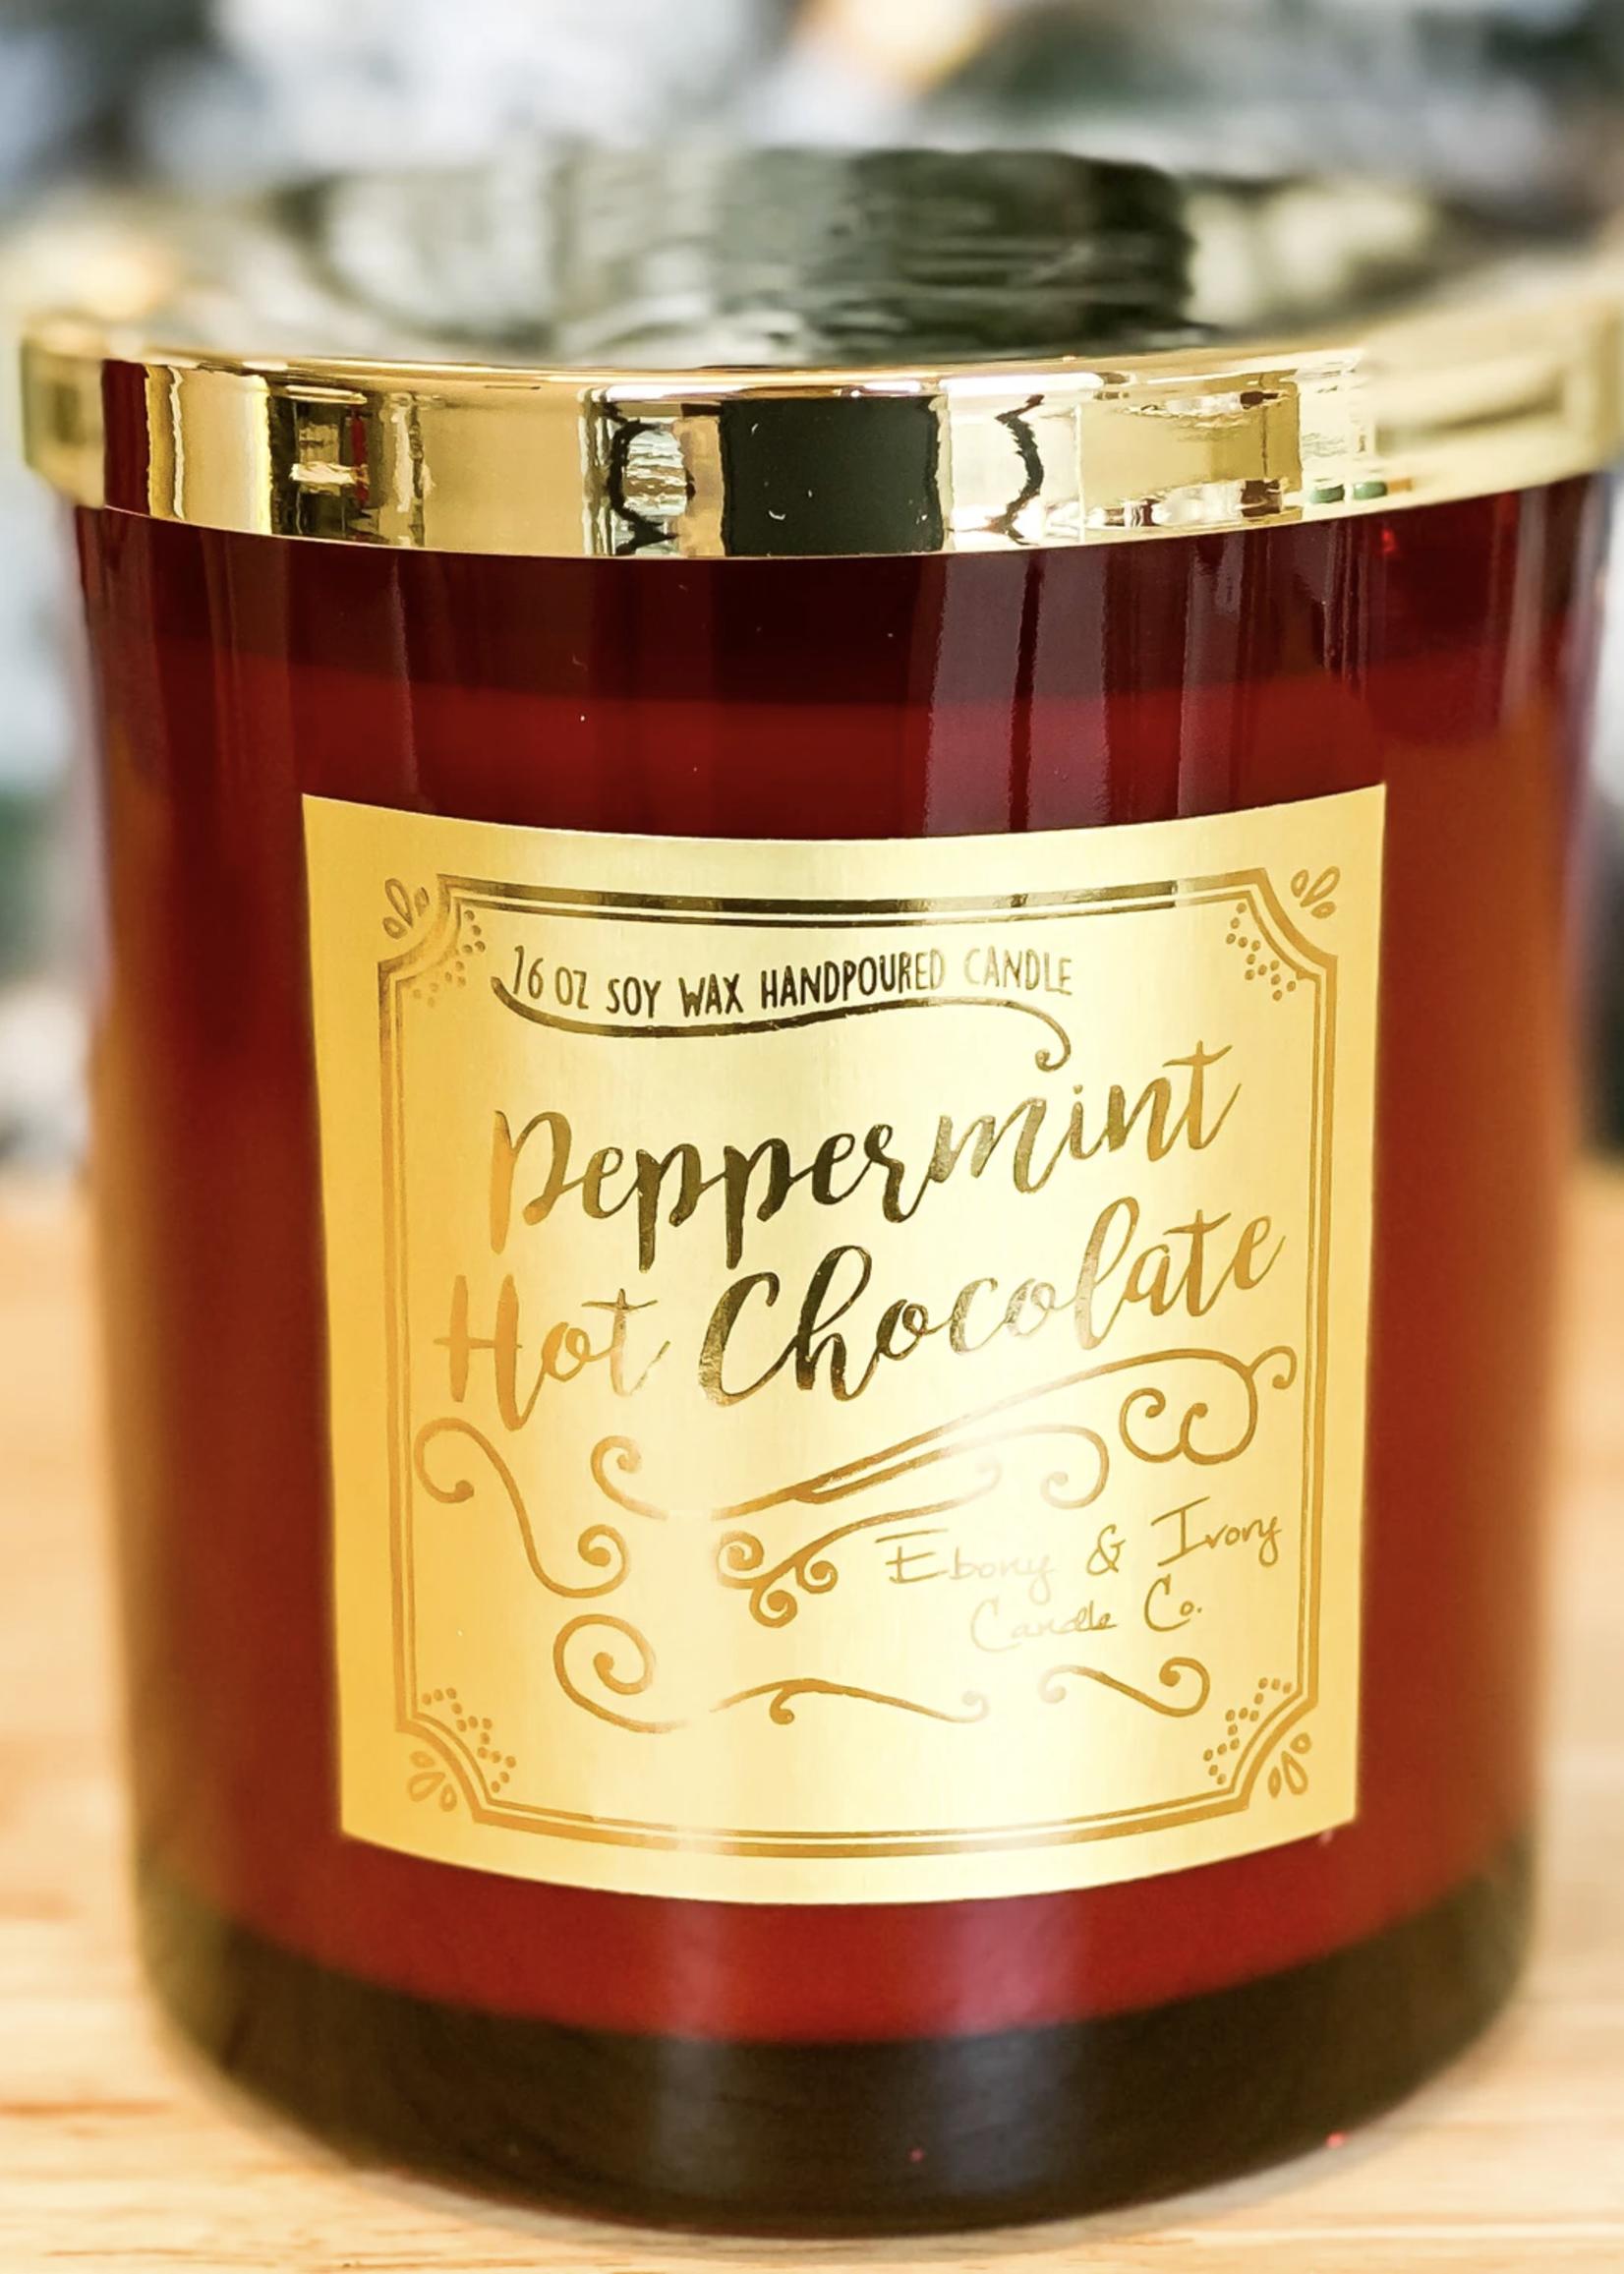 Ebony & Ivory Candle Co. Peppermint Hot Chocolate Candle 16oz